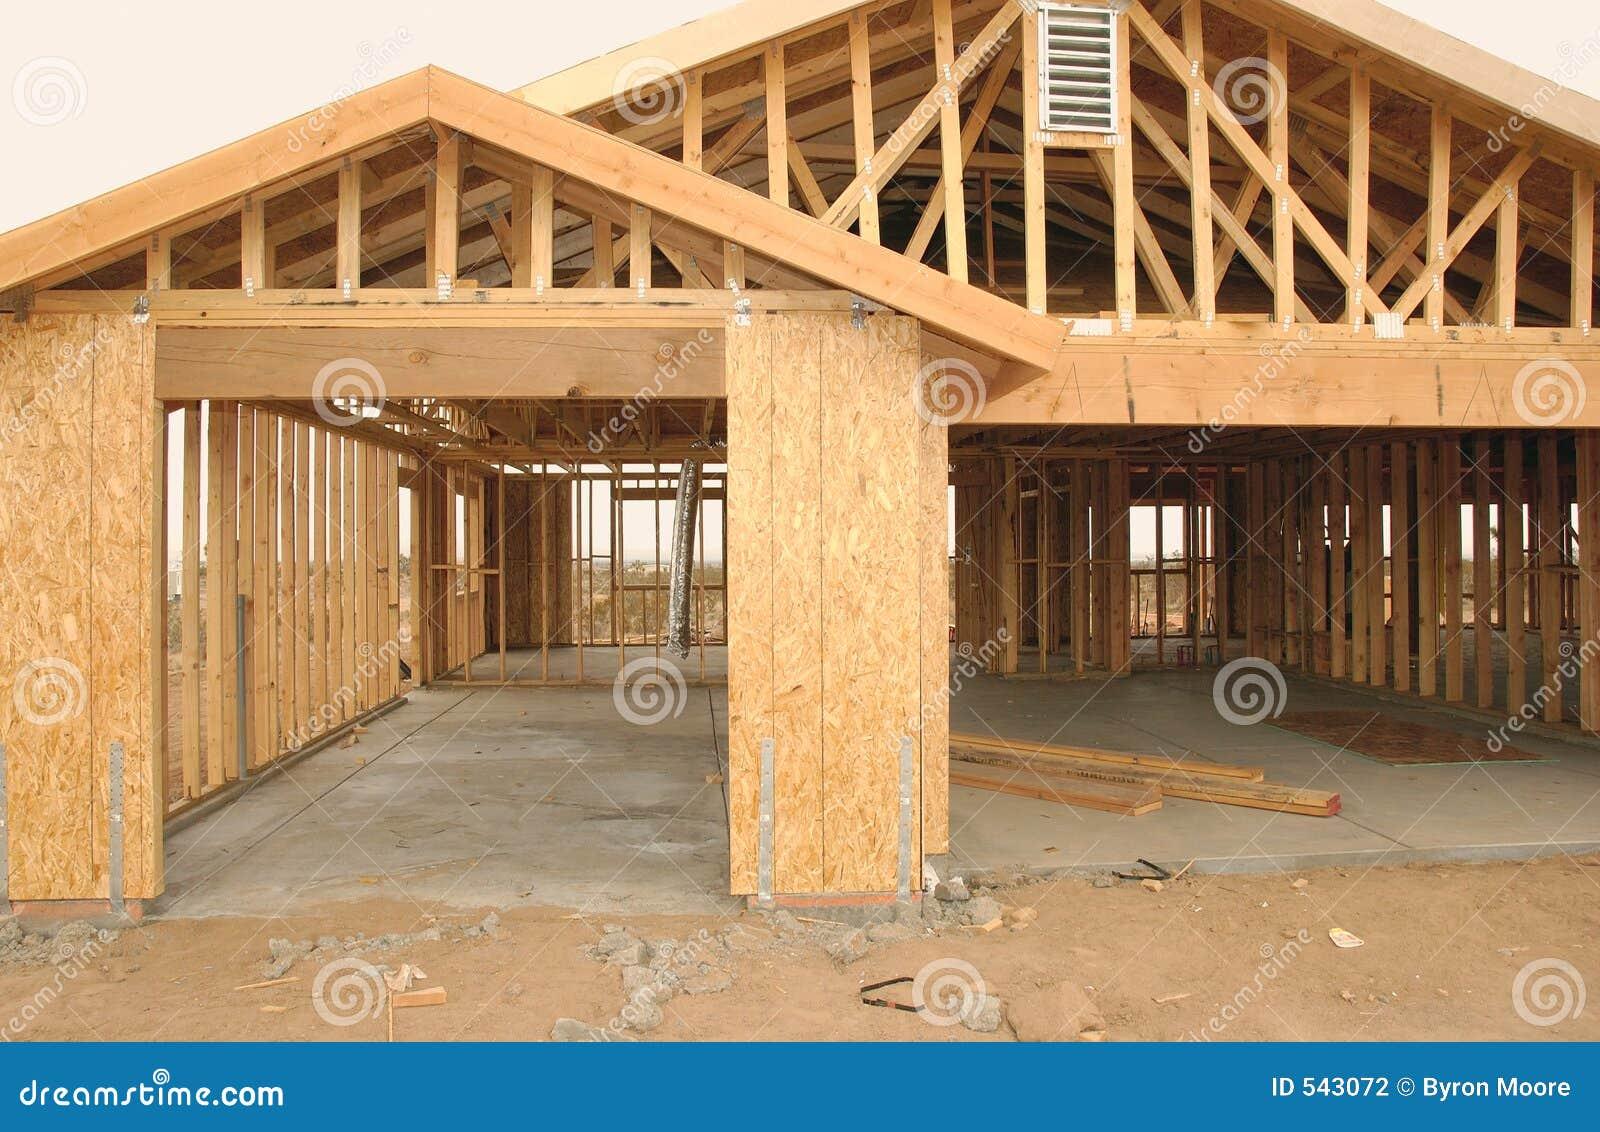 Download 房子 库存照片. 图片 包括有 开掘, 会议室, 合同, 制造, 房子, 图纸, 采购, 停车库, 重建, 改造 - 543072